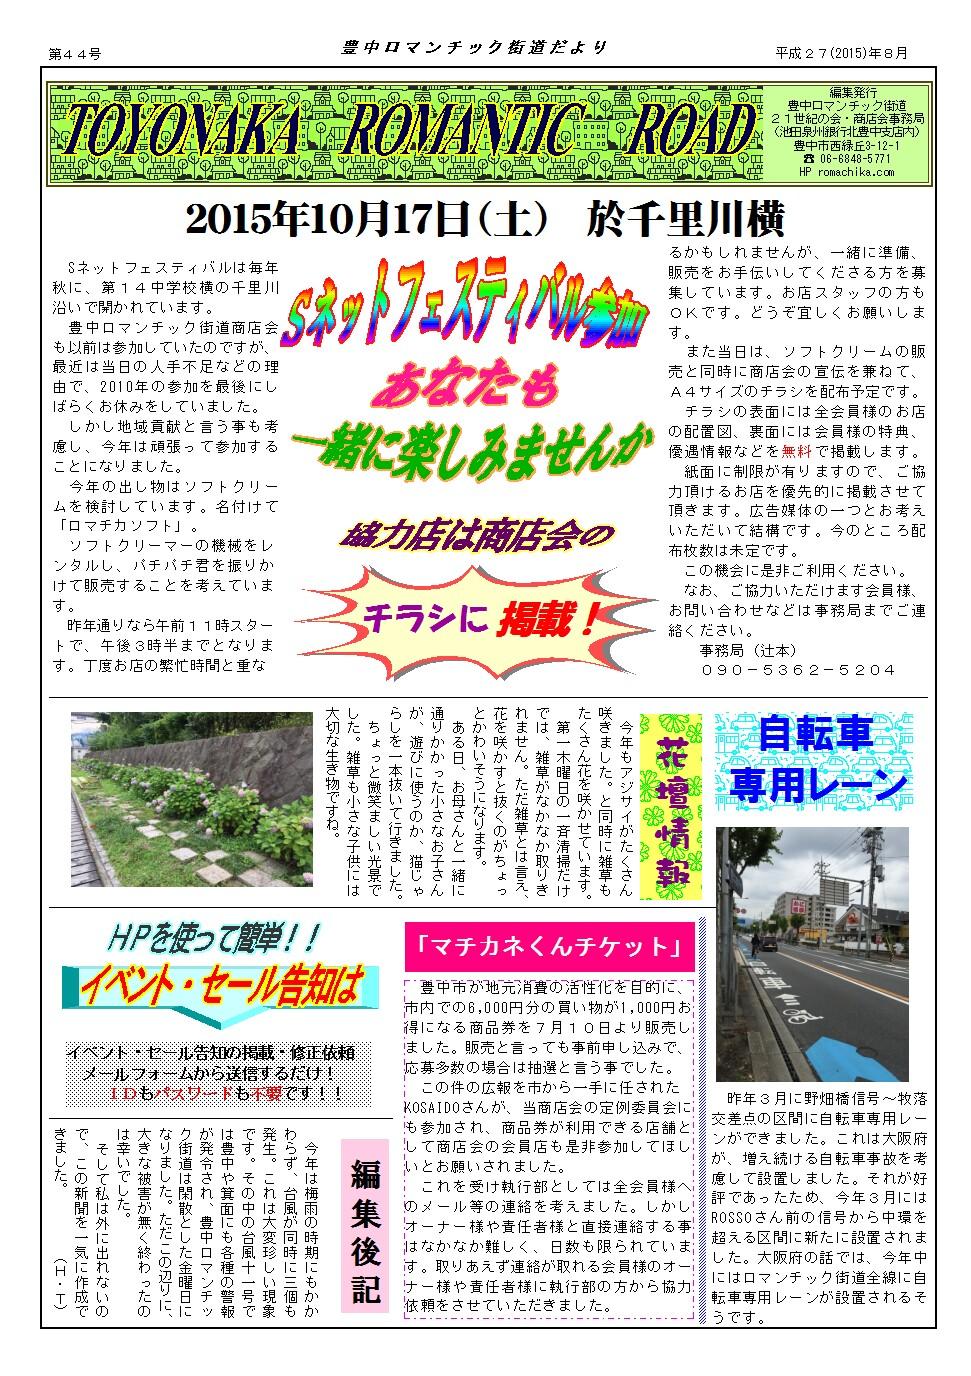 ロマ街新聞2015.8月号jpg (1)